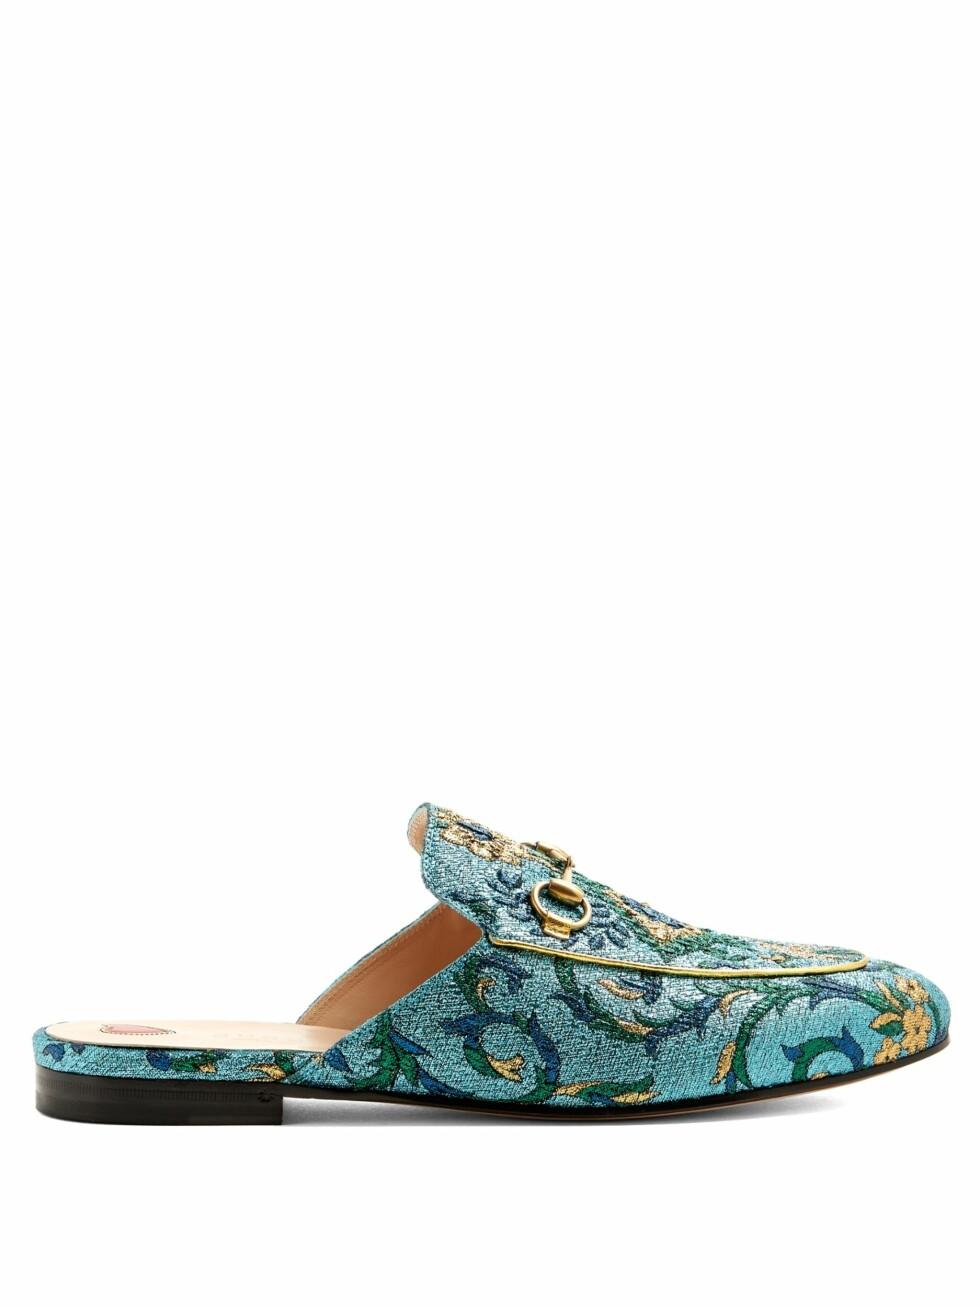 Loafers fra Gucci via Matchesfashion.com  4790,-  https://www.matchesfashion.com/intl/products/Gucci-Princetown-jacquard-backless-loafers--1096002